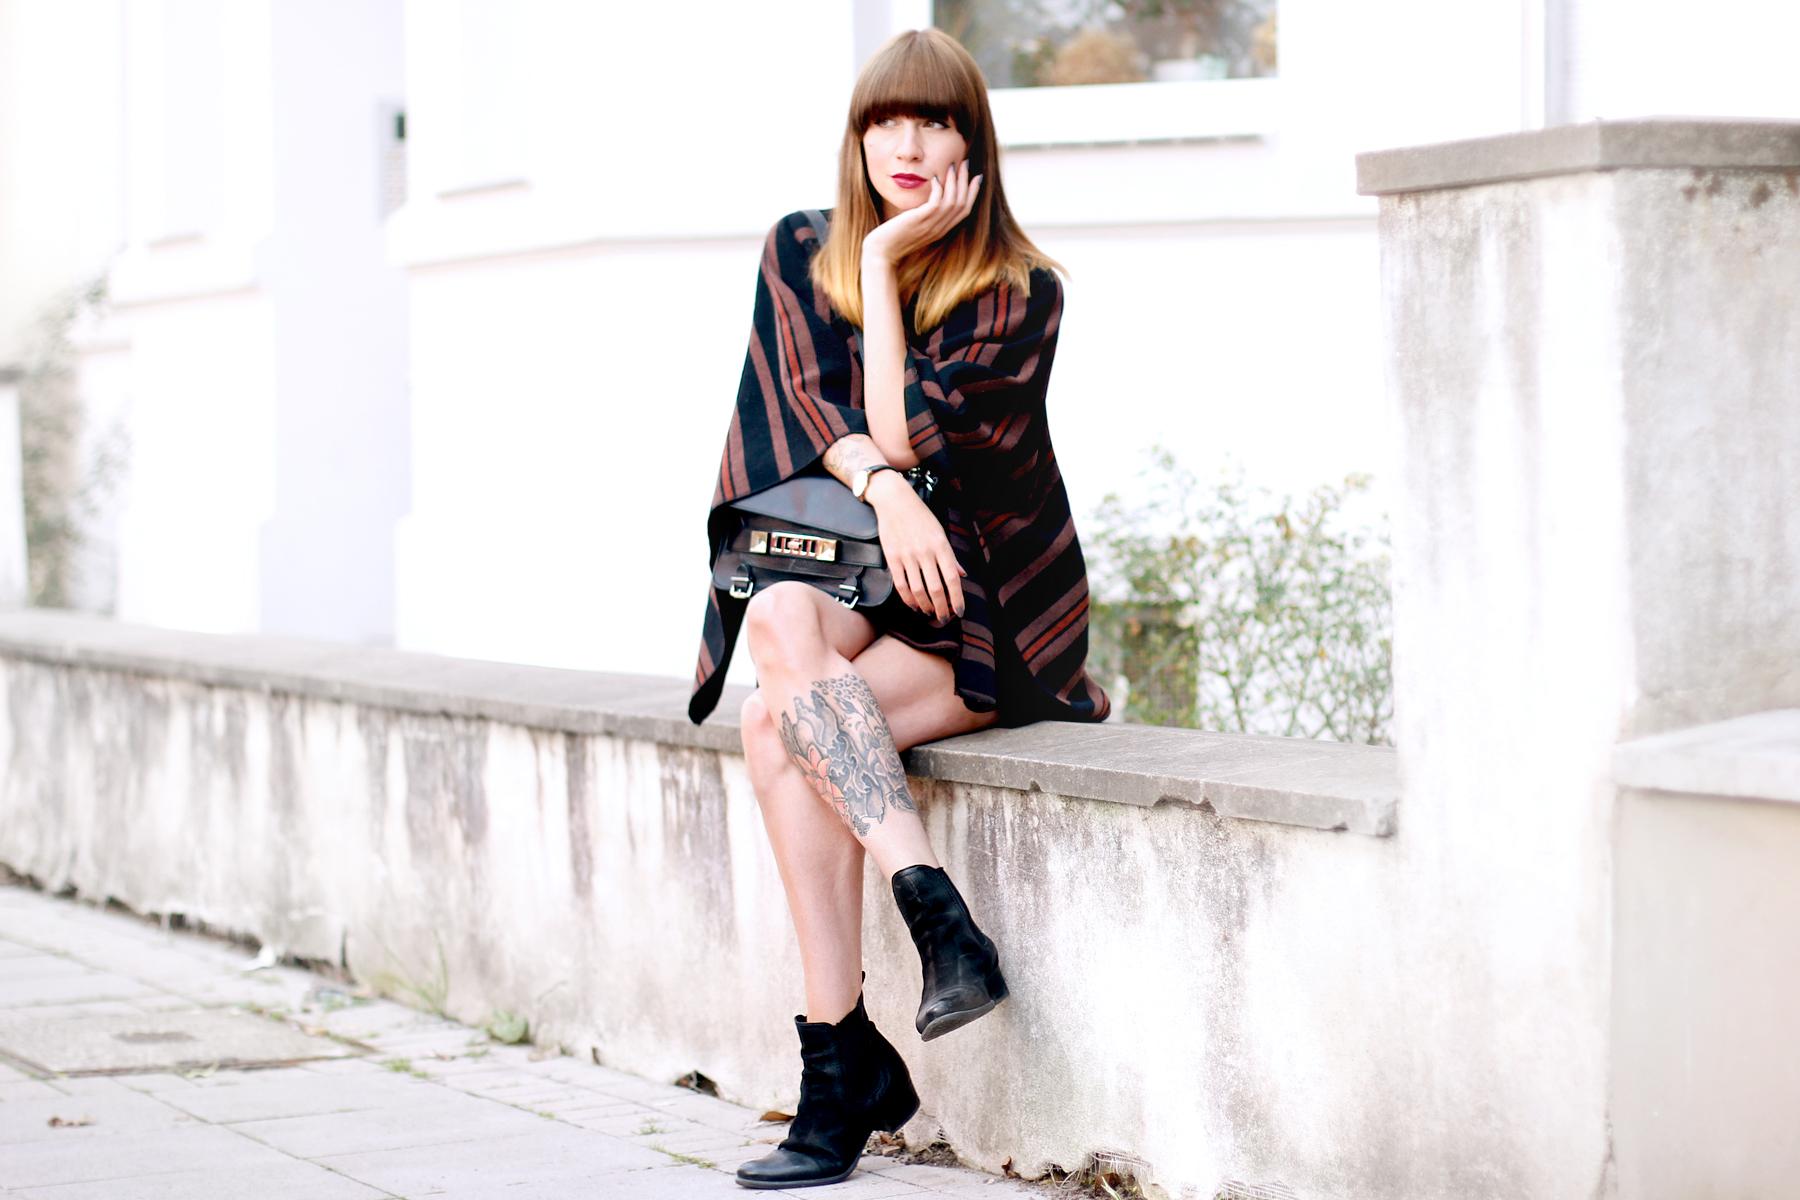 poncho lee jeans autumn cape boots sacha schuhe proenza schouler ps11 fashionblogger ricarda schernus blog düsseldorf hannover berlin cats & dogs 6